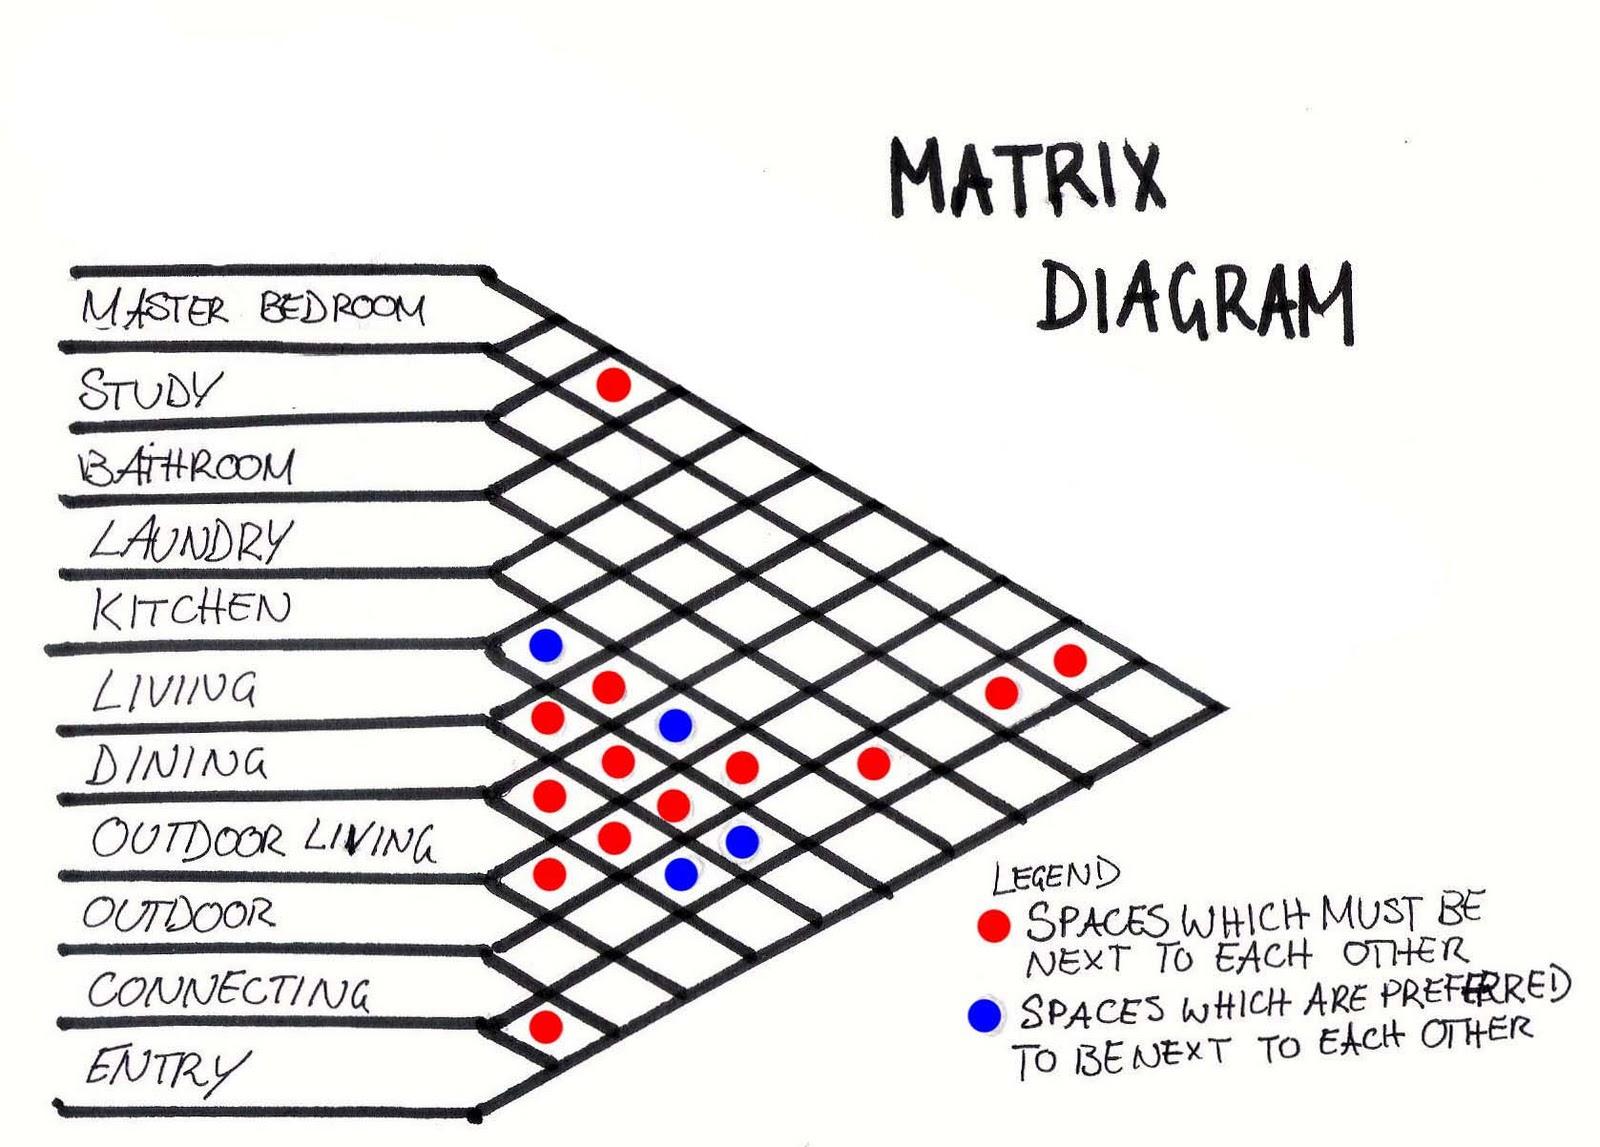 master plan architecture bubble diagram pex plumbing house planning www toyskids co tasarim s u00dcrec u0130 d u0130yagrami u015elev u015eemasi matr u0130ks diagrams site